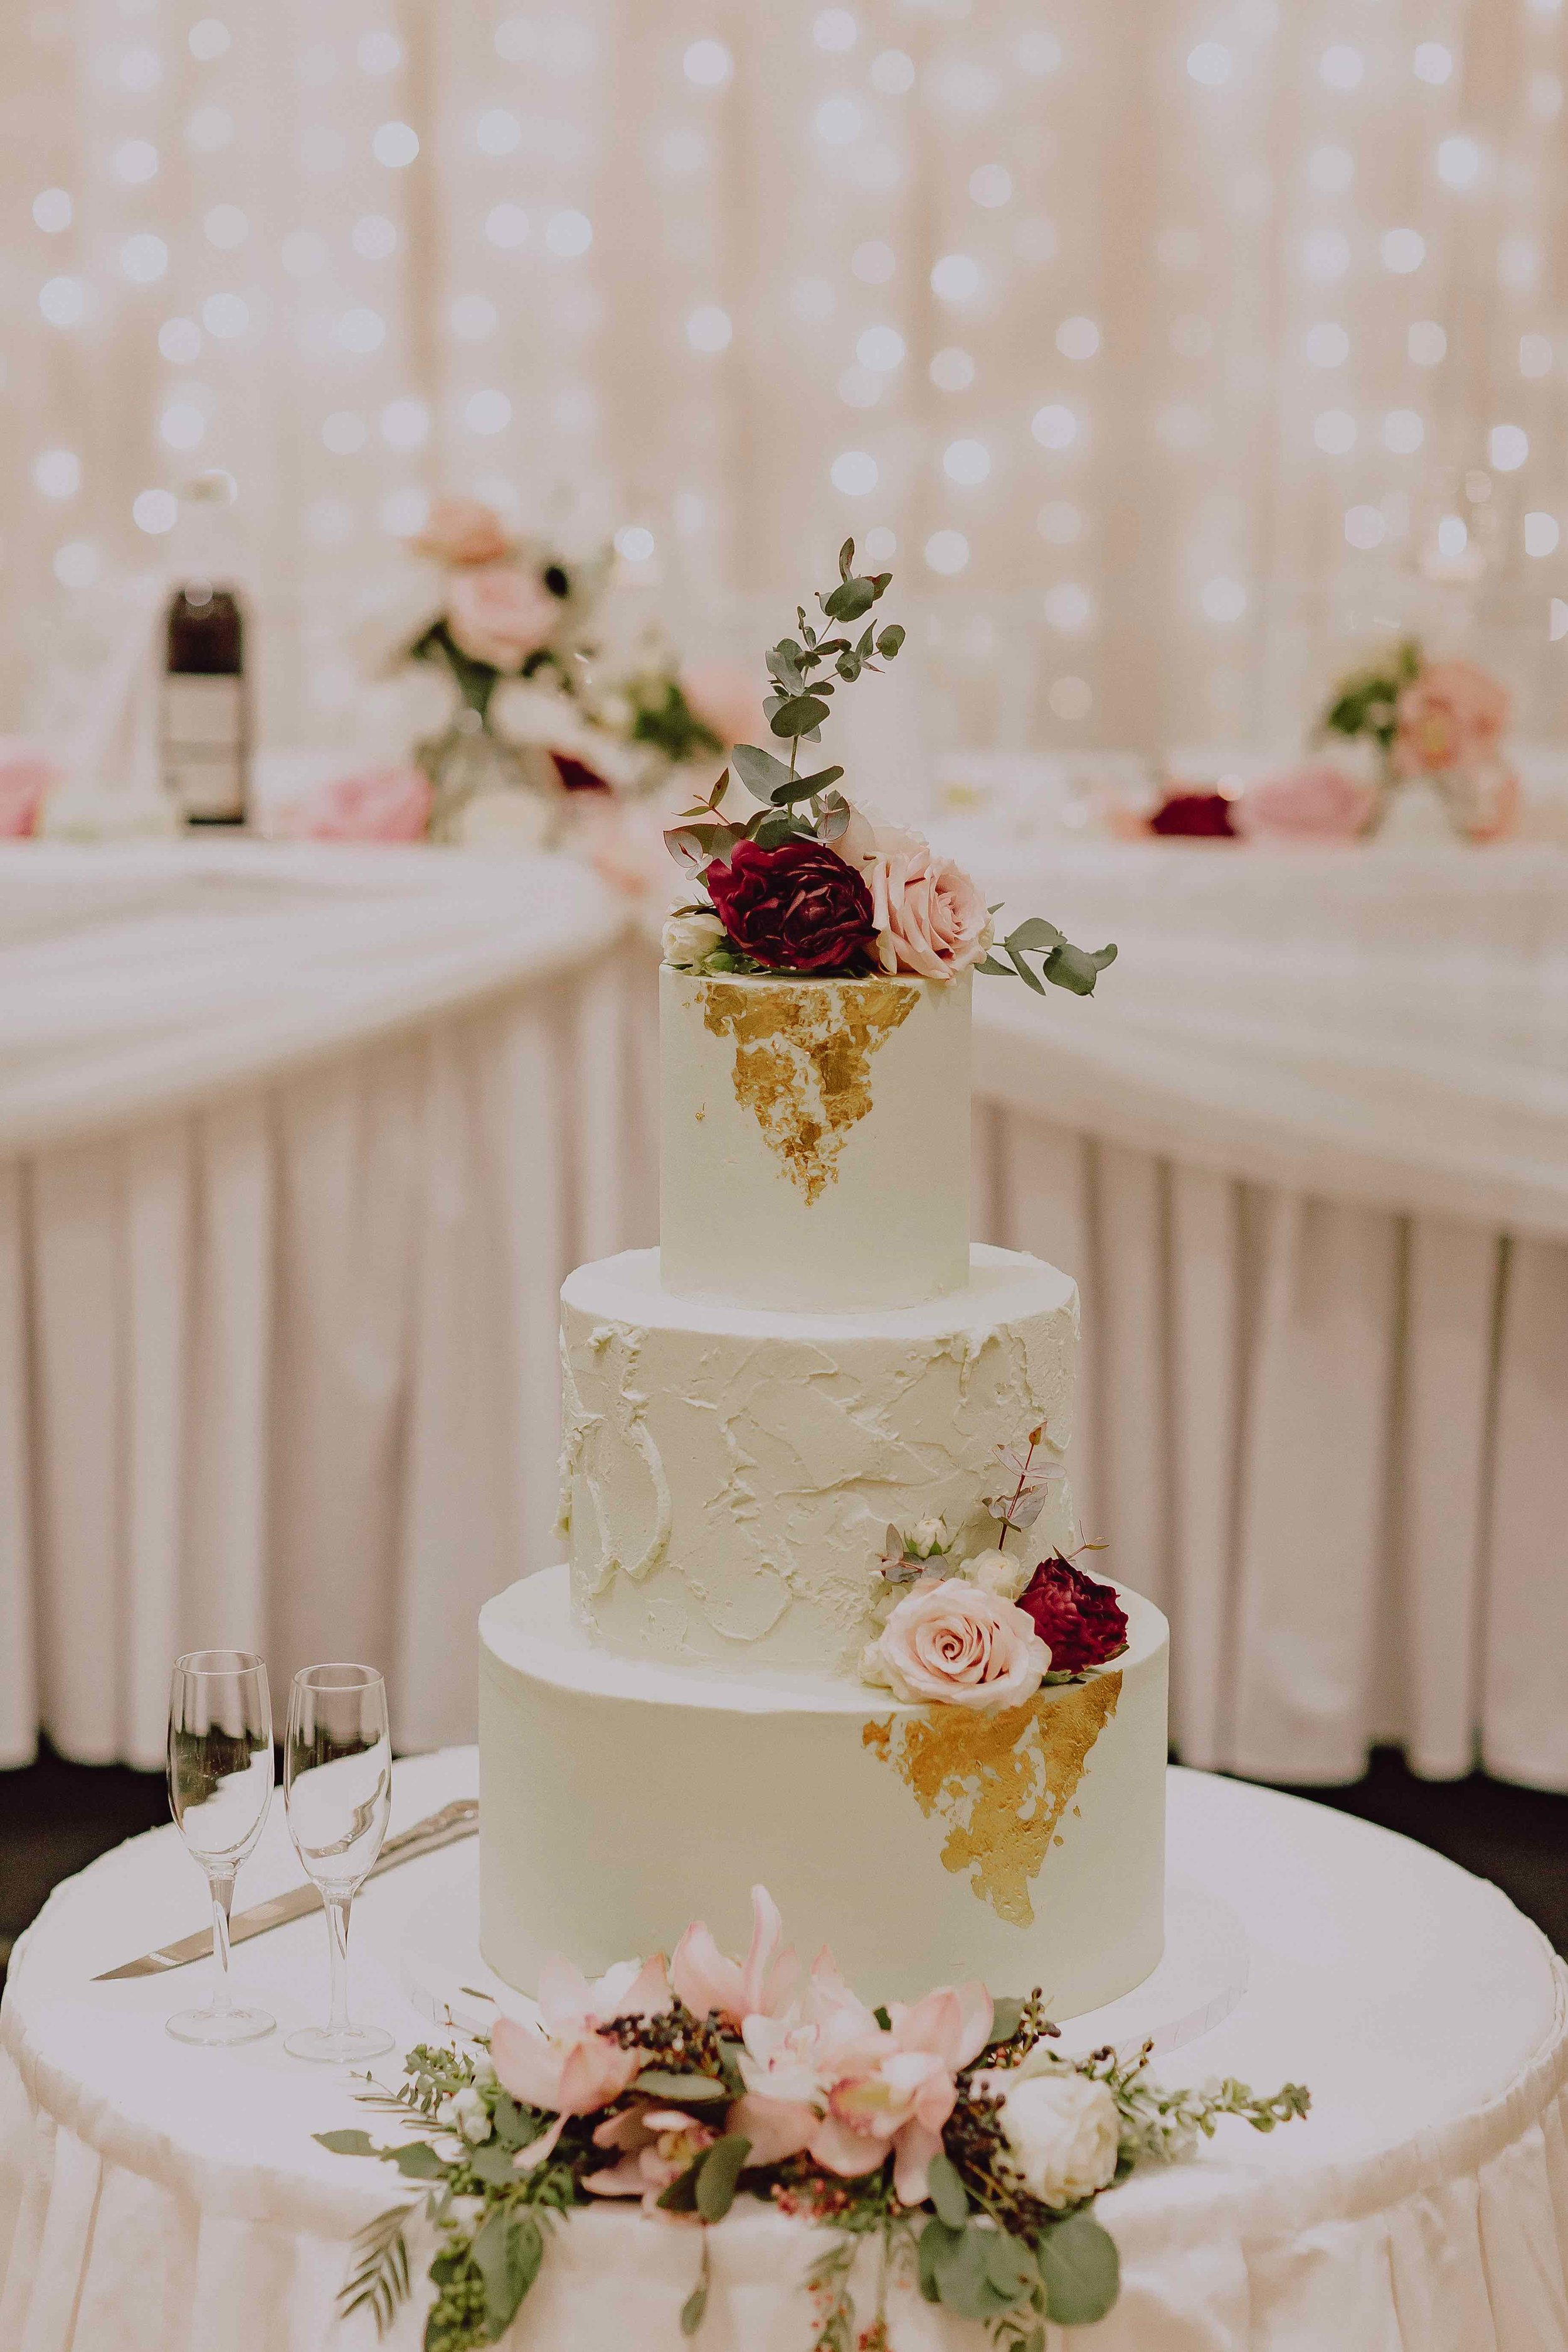 Three tier wedding cake at the ballroom, Mindel Beach casino and resort.